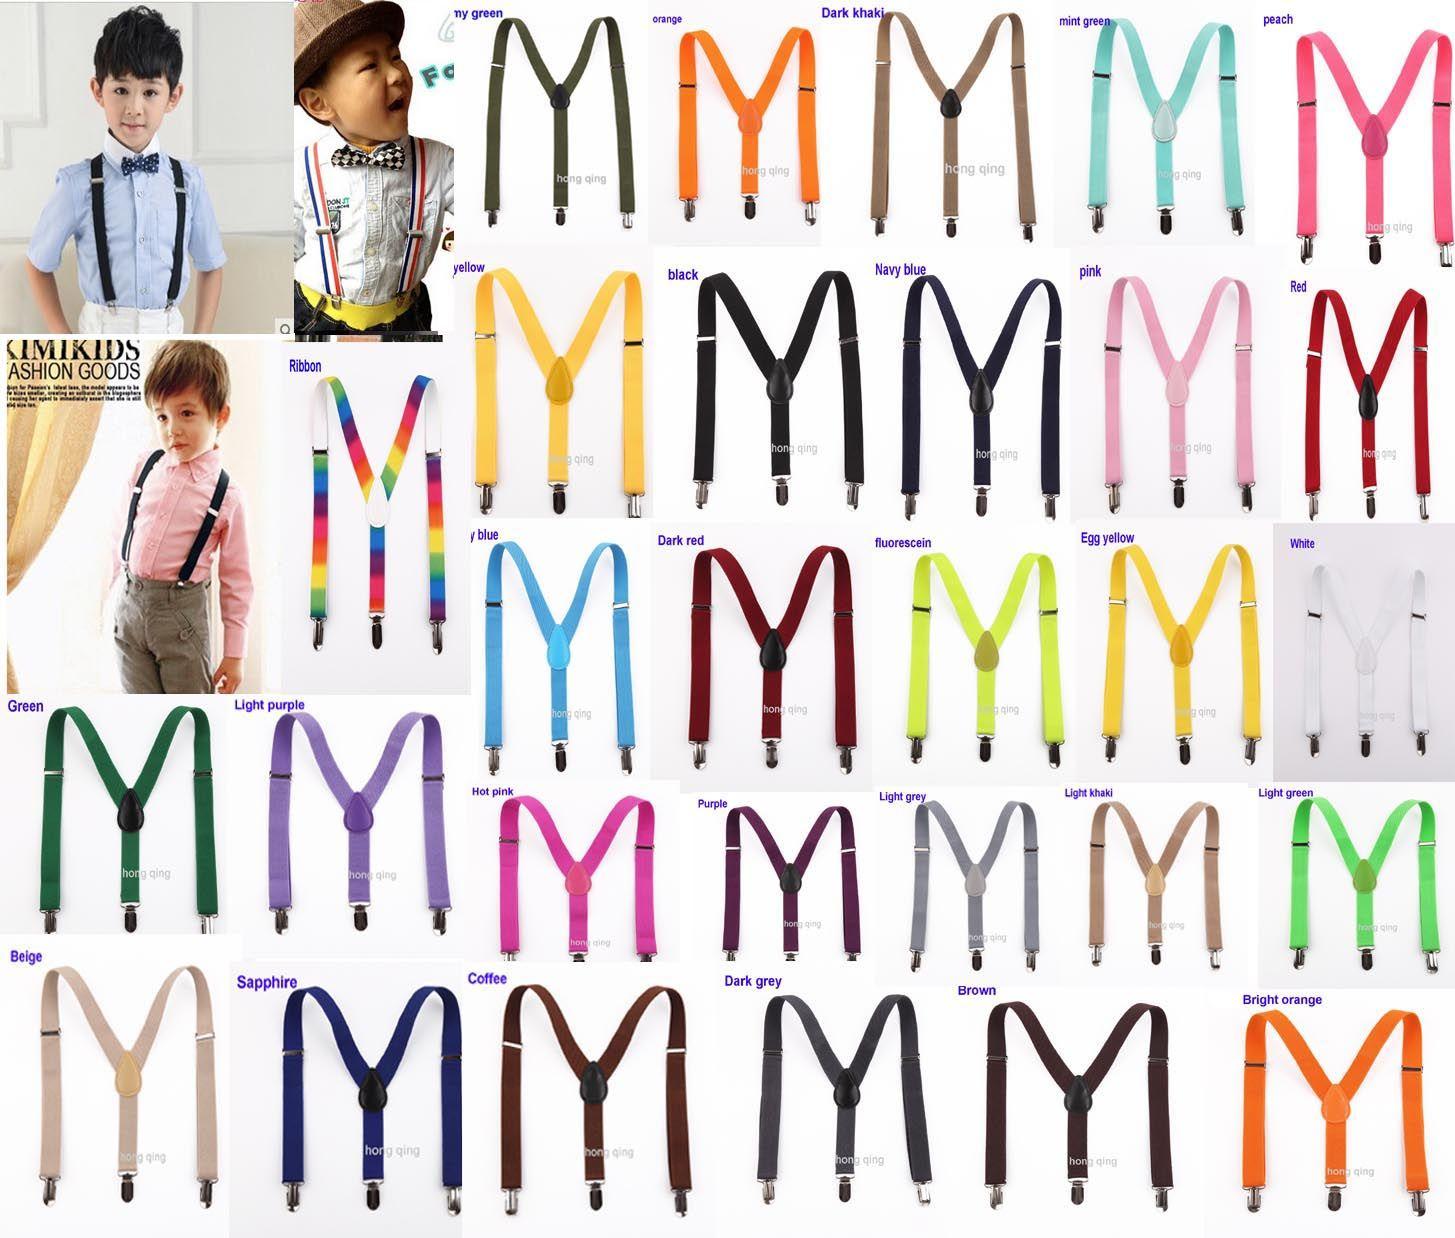 Kinder Hosenträger Kleidung Kind Casual Hosen Mode Lange Hosen Hosenträger Hosenträger Jungen Hosen Kinder Hosen Kinder Kleidung